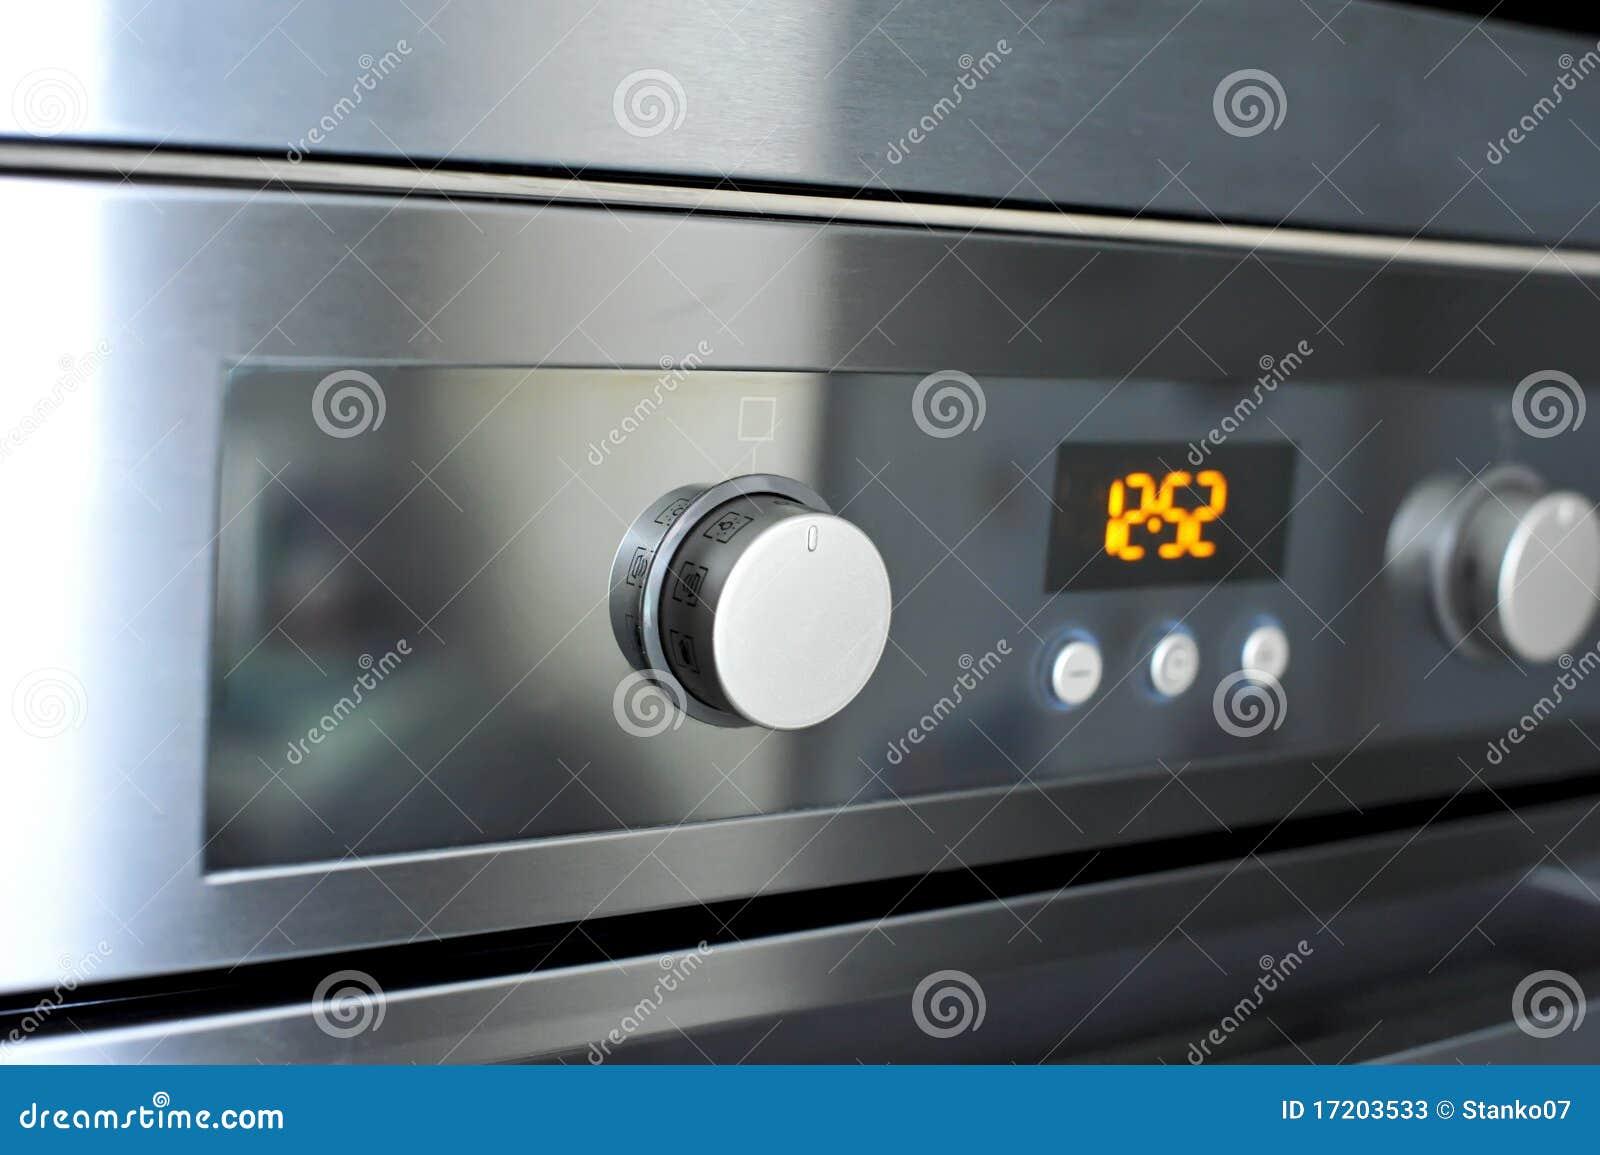 Programs knob